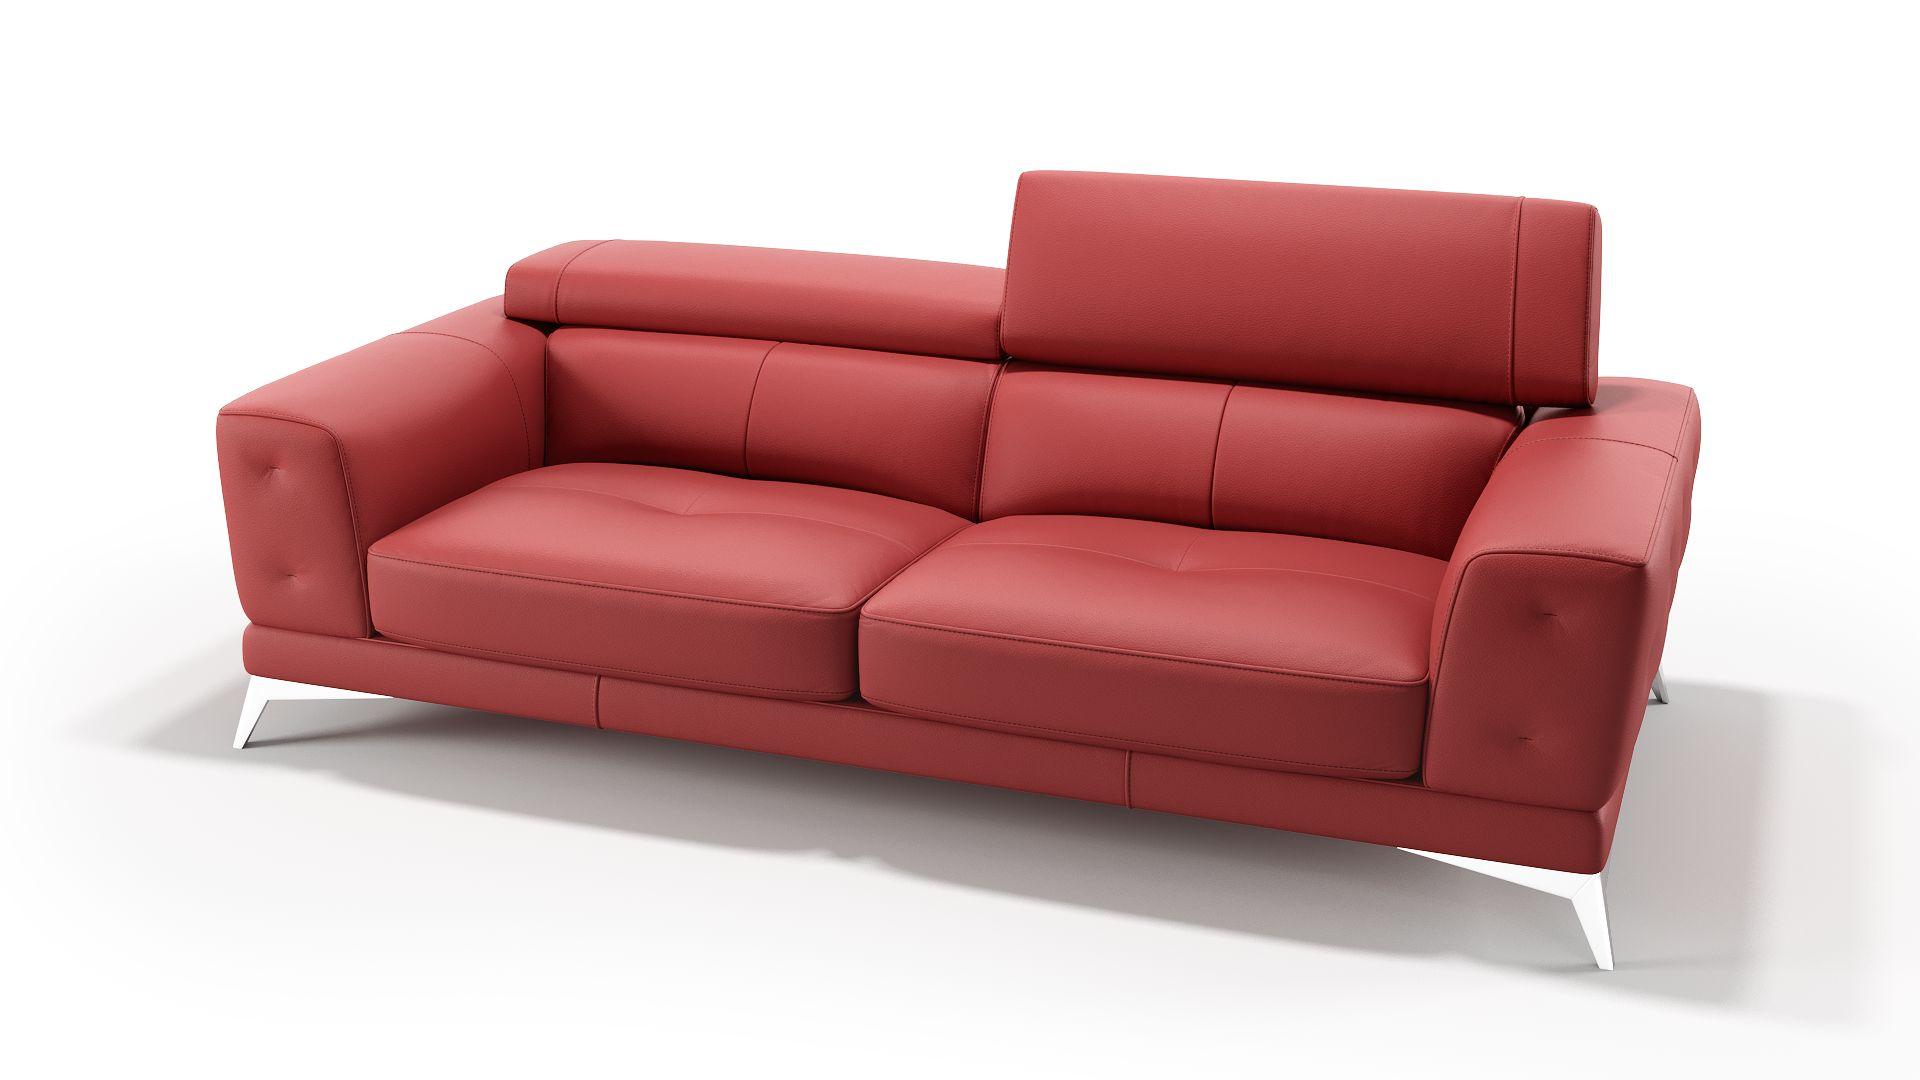 Leder 3-Sitzer Sofa CEPRANO